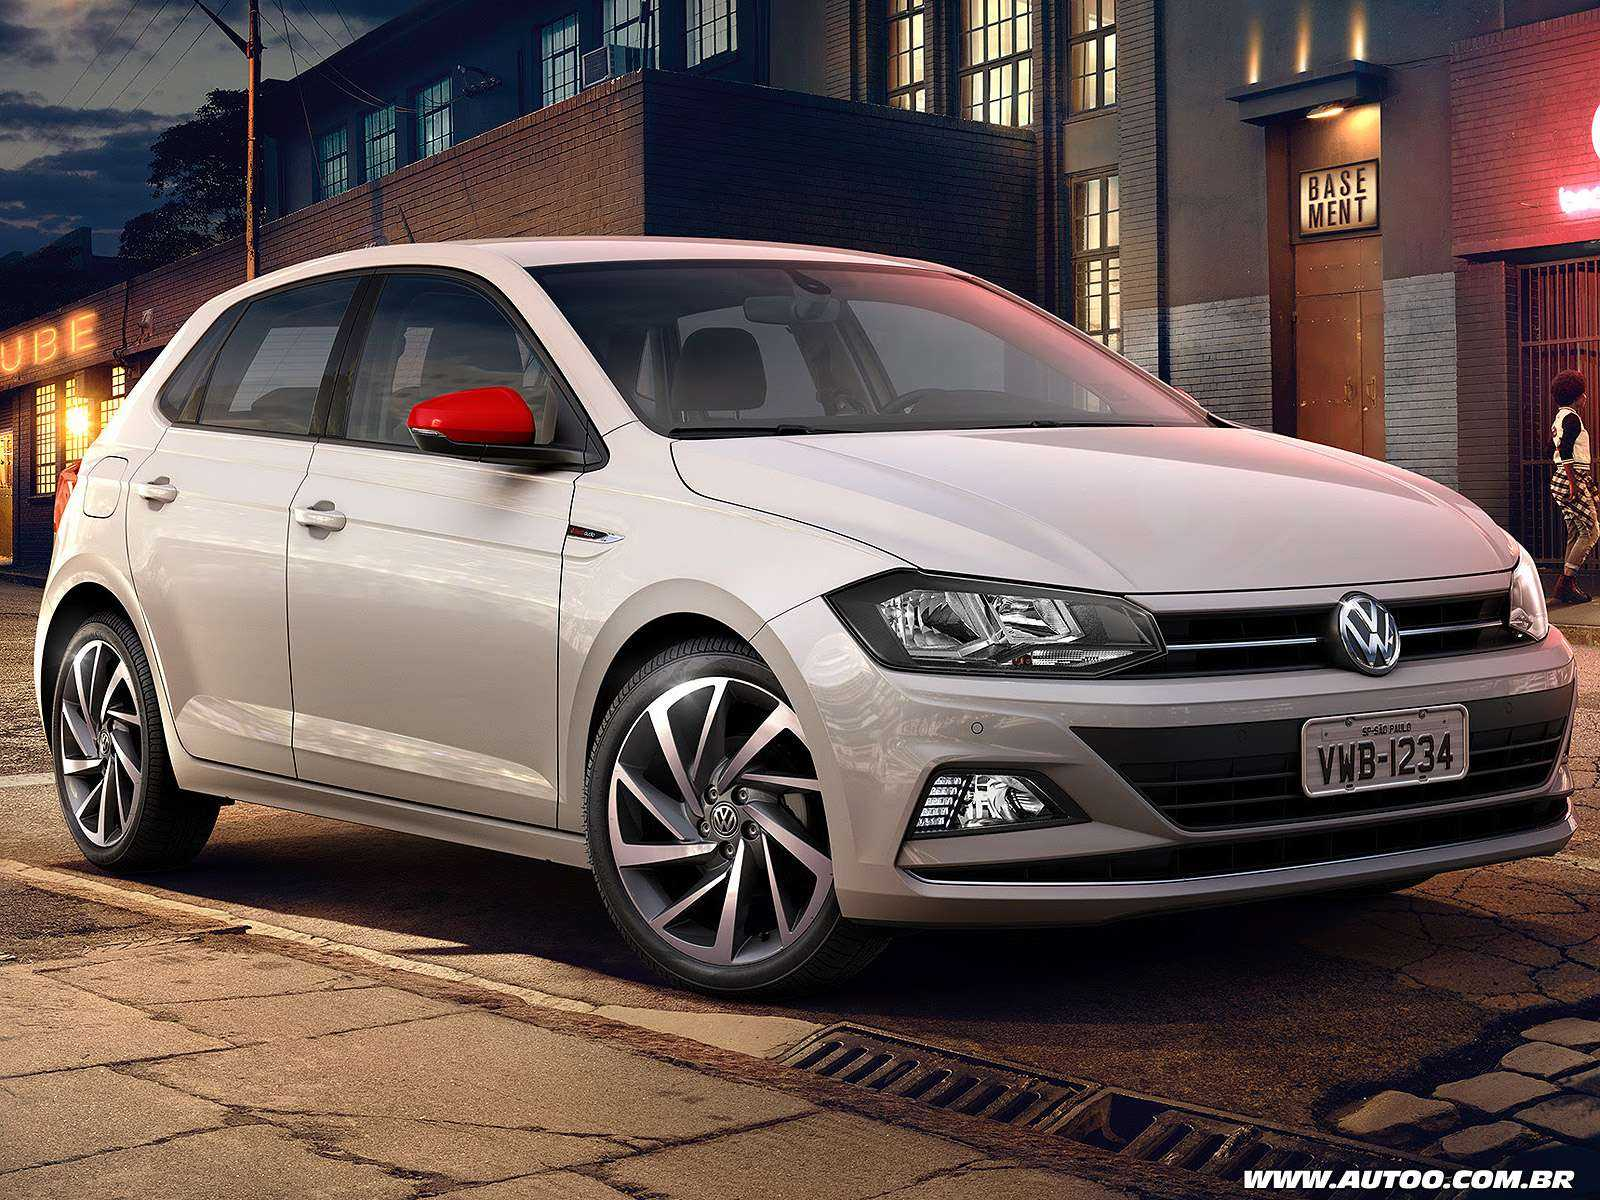 VolkswagenPolo 2019 - ângulo frontal